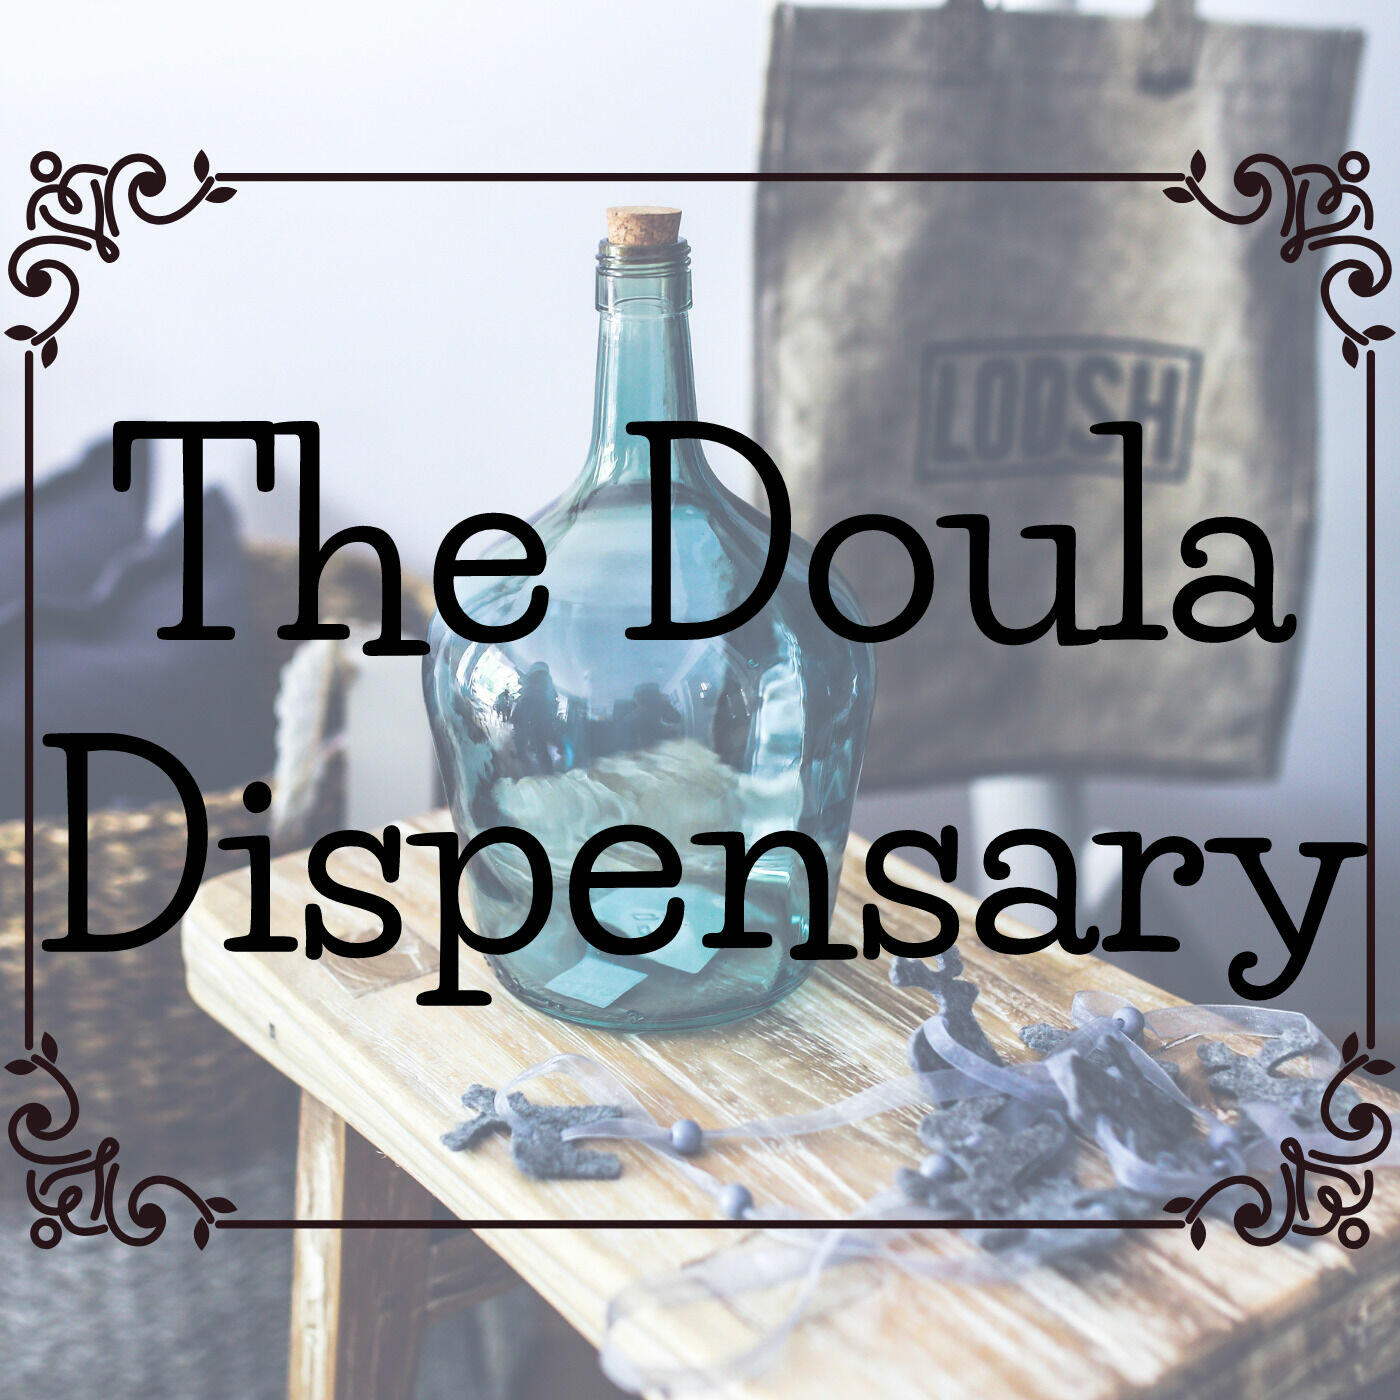 The Doula Dispensary